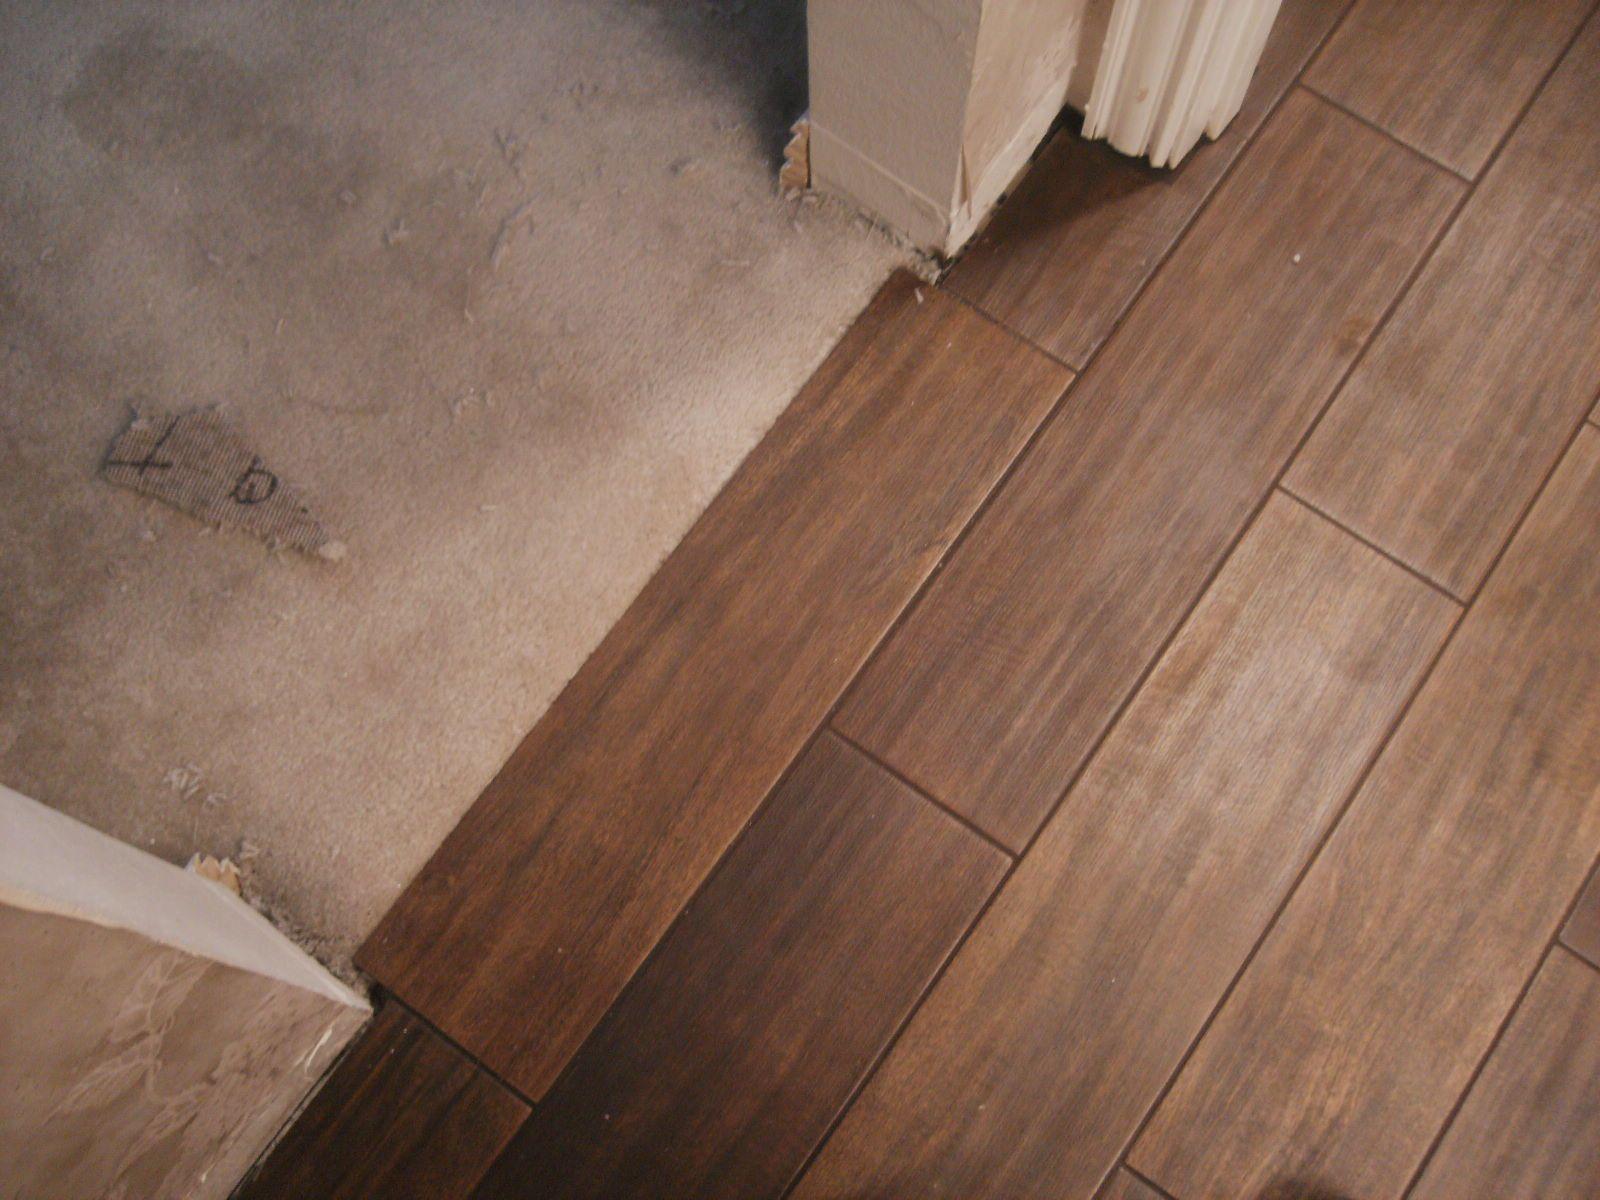 Wood 15x60 Collection of porcelain tiles wood effect floor